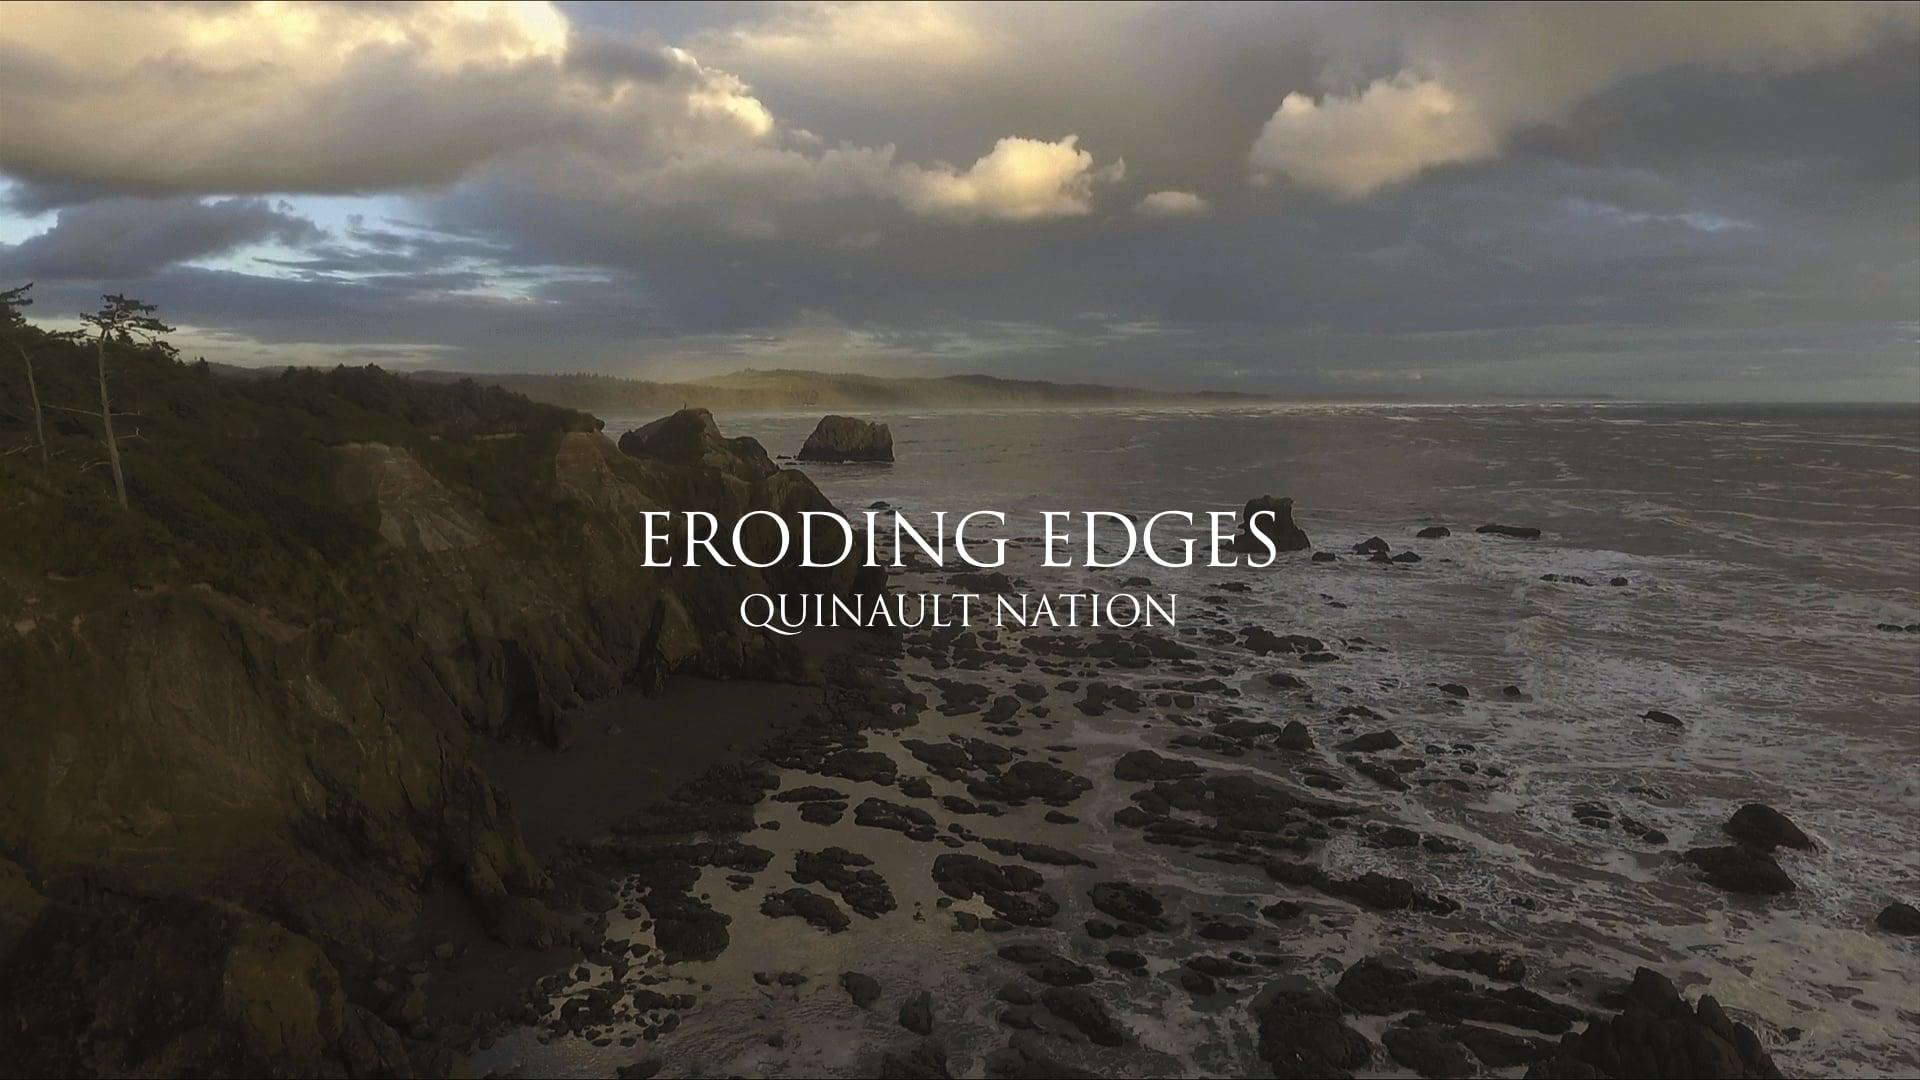 Eroding Edges - Quinault Nation